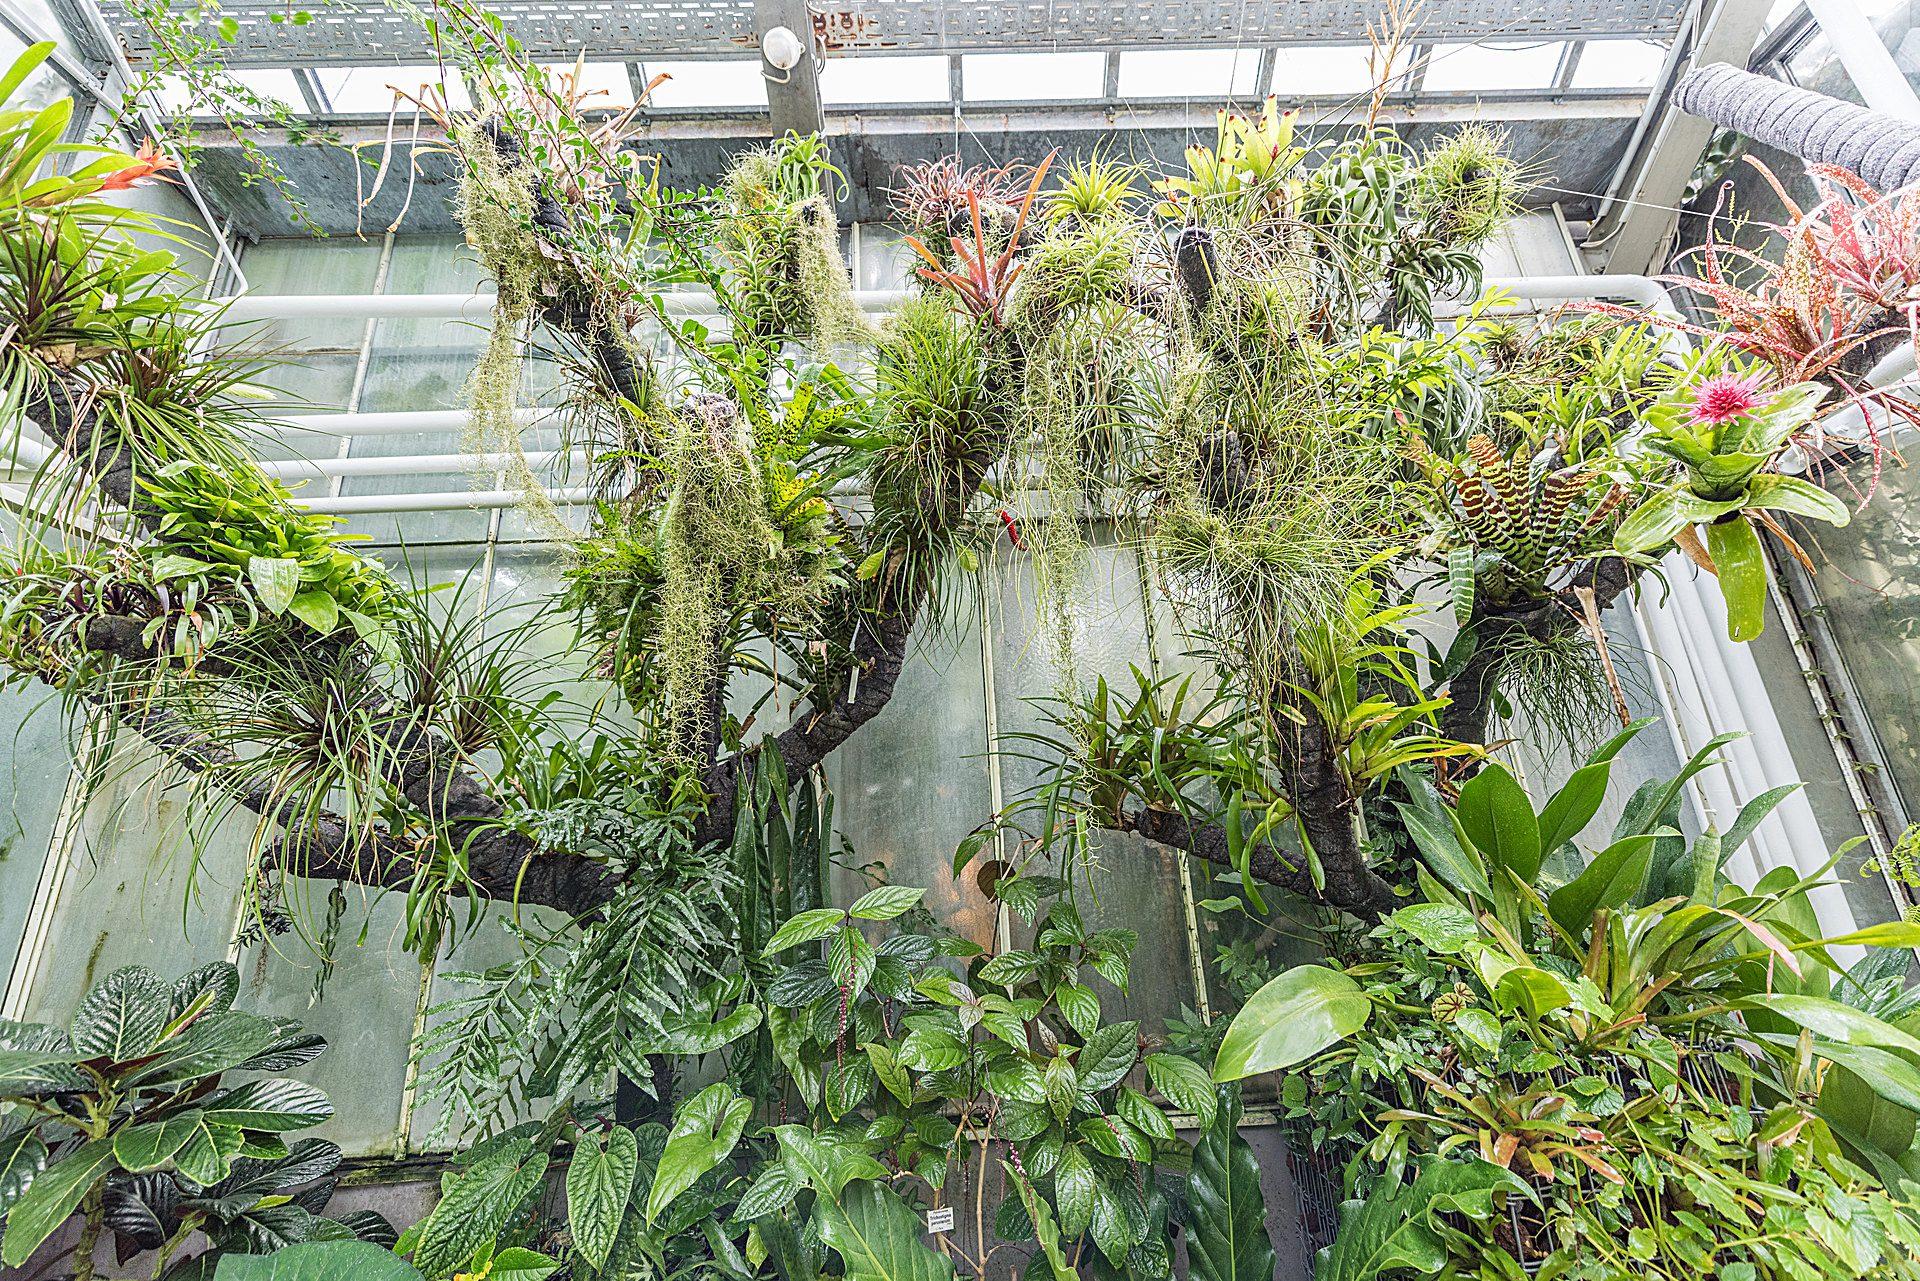 Botanischer Garten Erlangen - Botanischer Garten